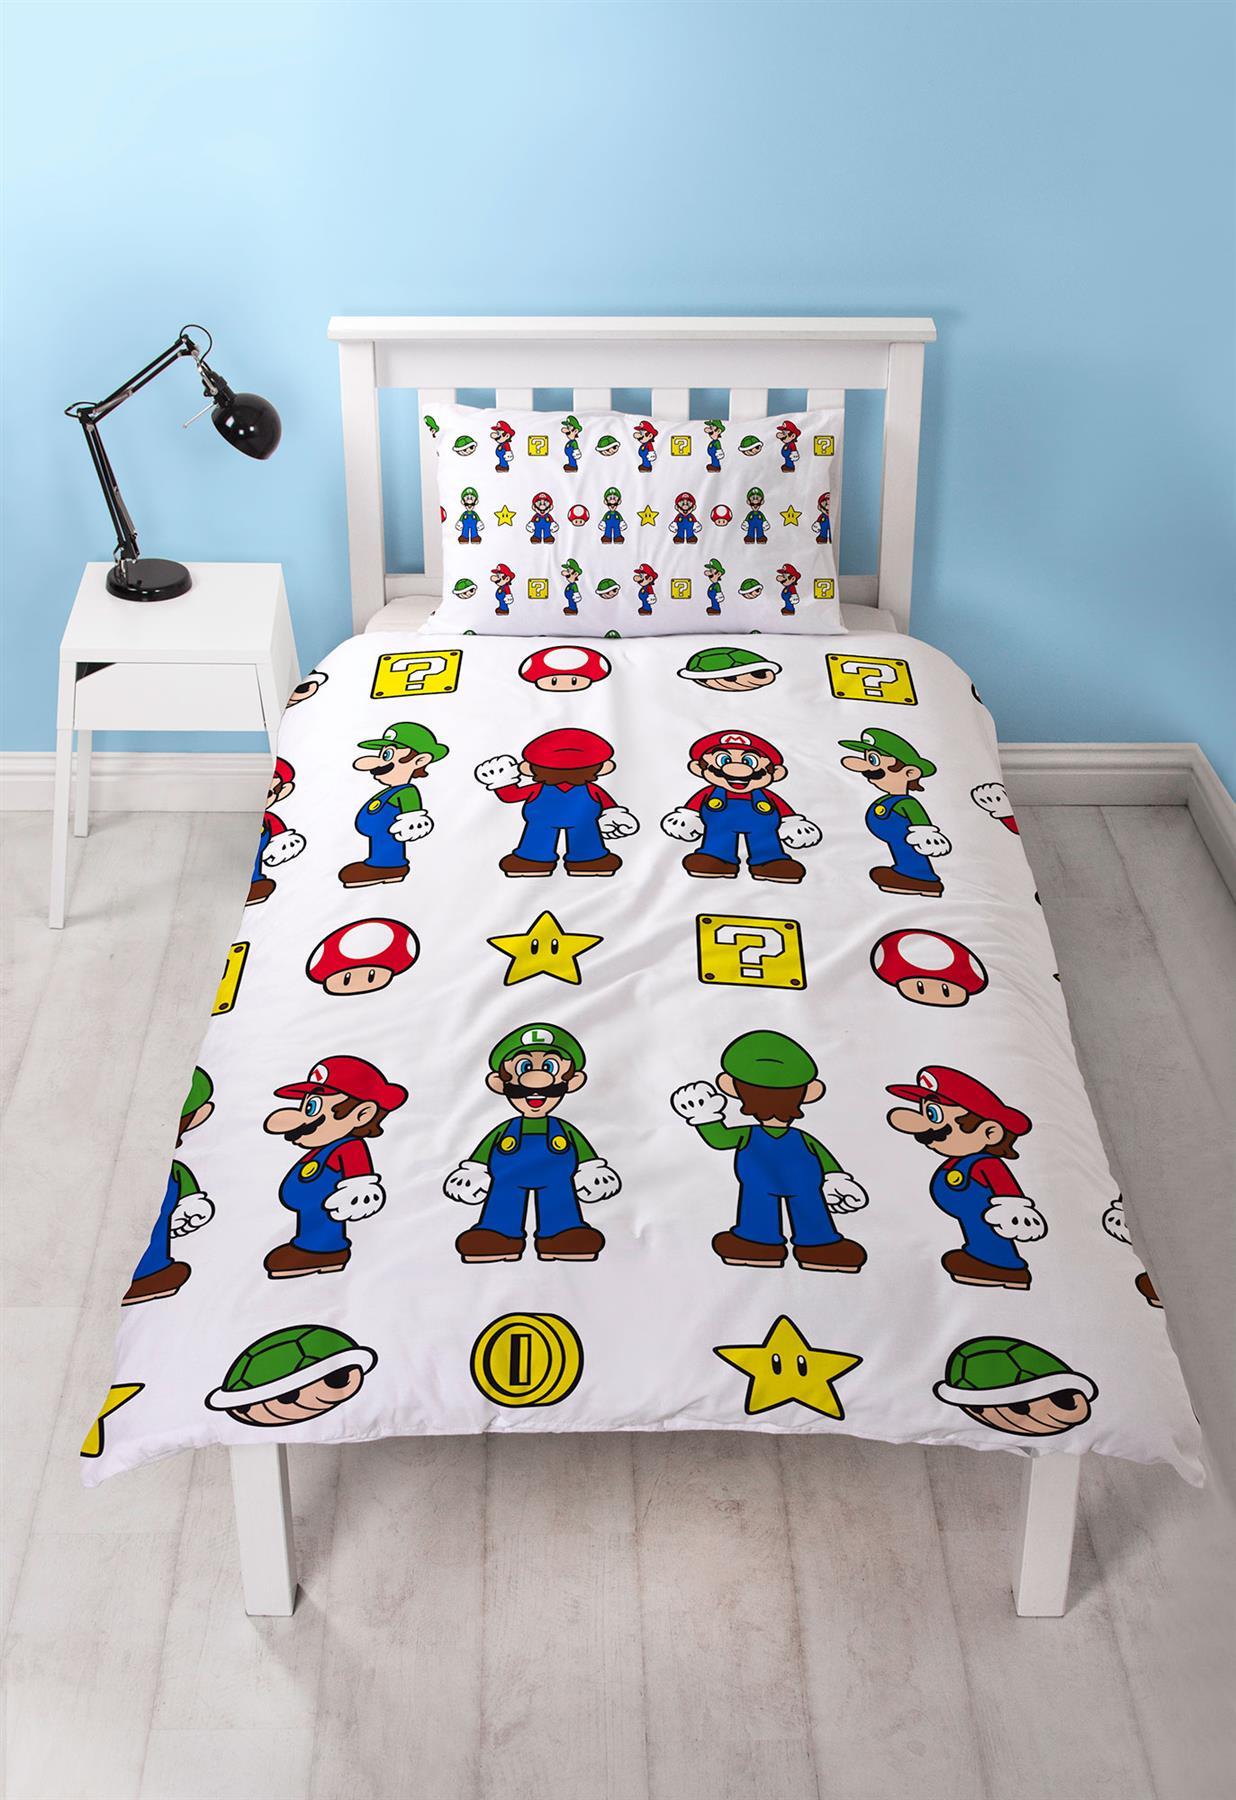 Official-Nintendo-Super-Mario-Licensed-Duvet-Covers-Single-Double-Odyssey-Maker thumbnail 35